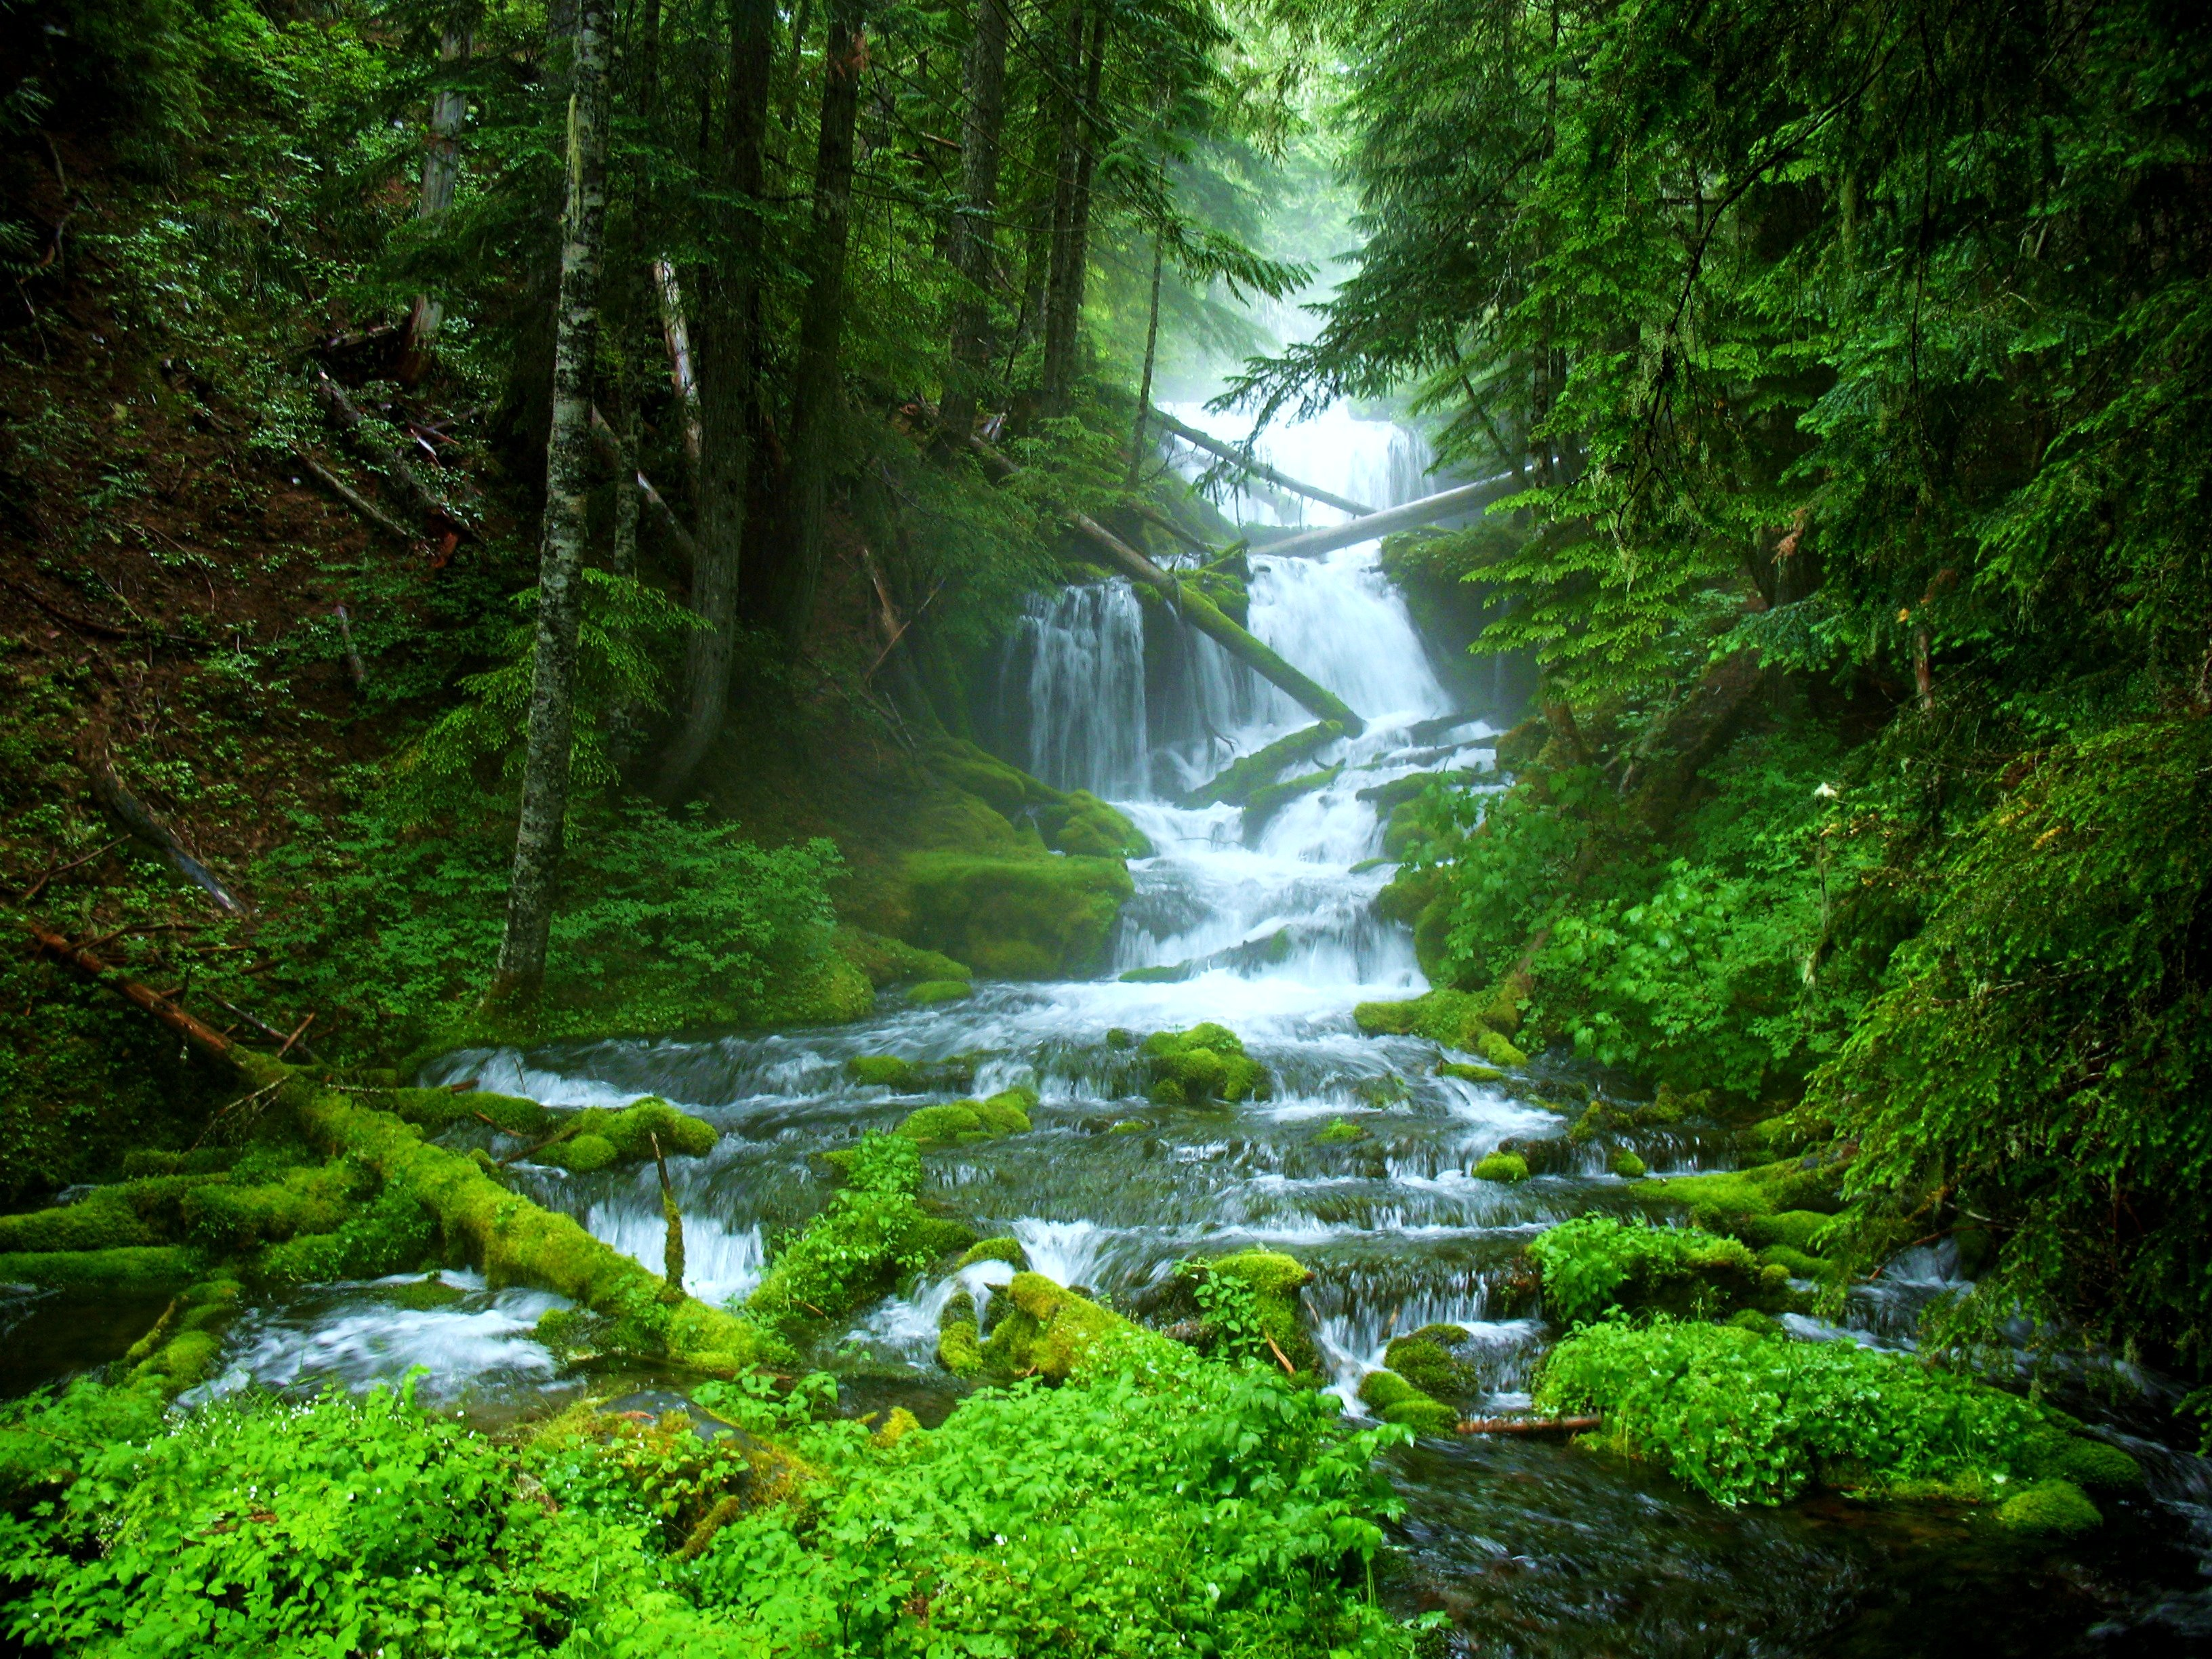 Rocky mountain stream got dirt nature photo contest ImgStockscom 3264x2448